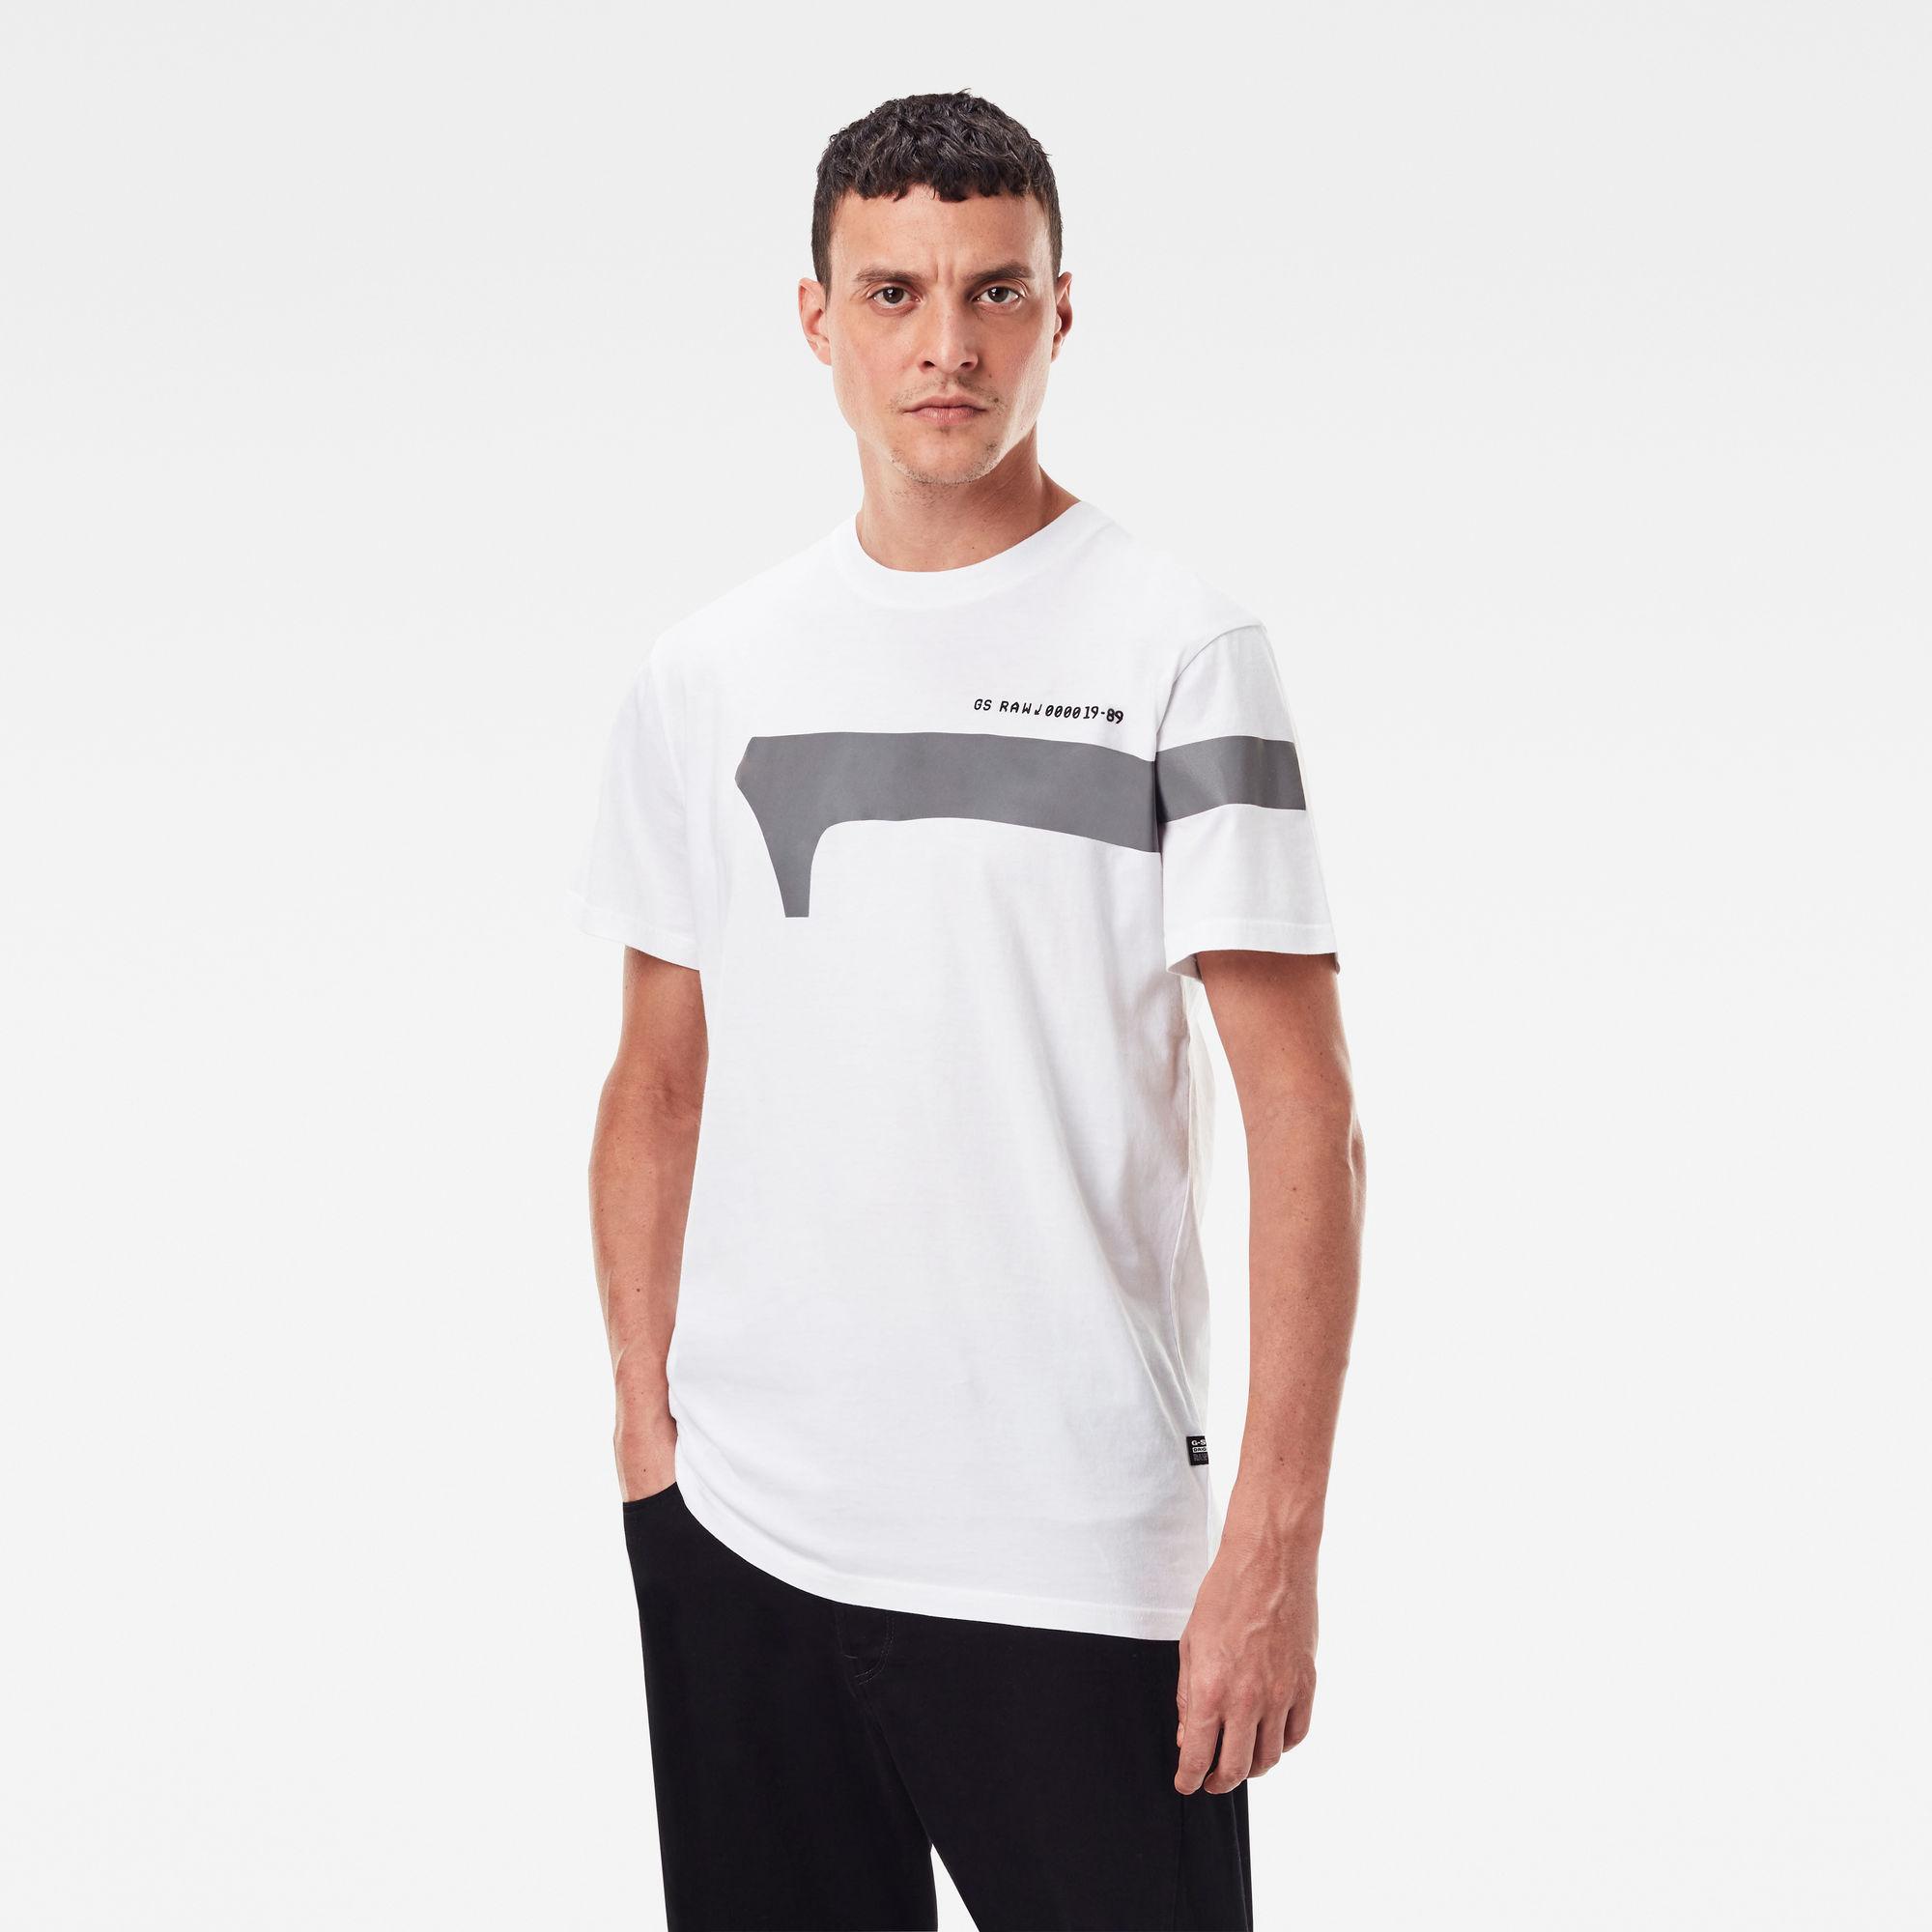 G-Star RAW Heren 1 Reflective Graphic T-Shirt Wit